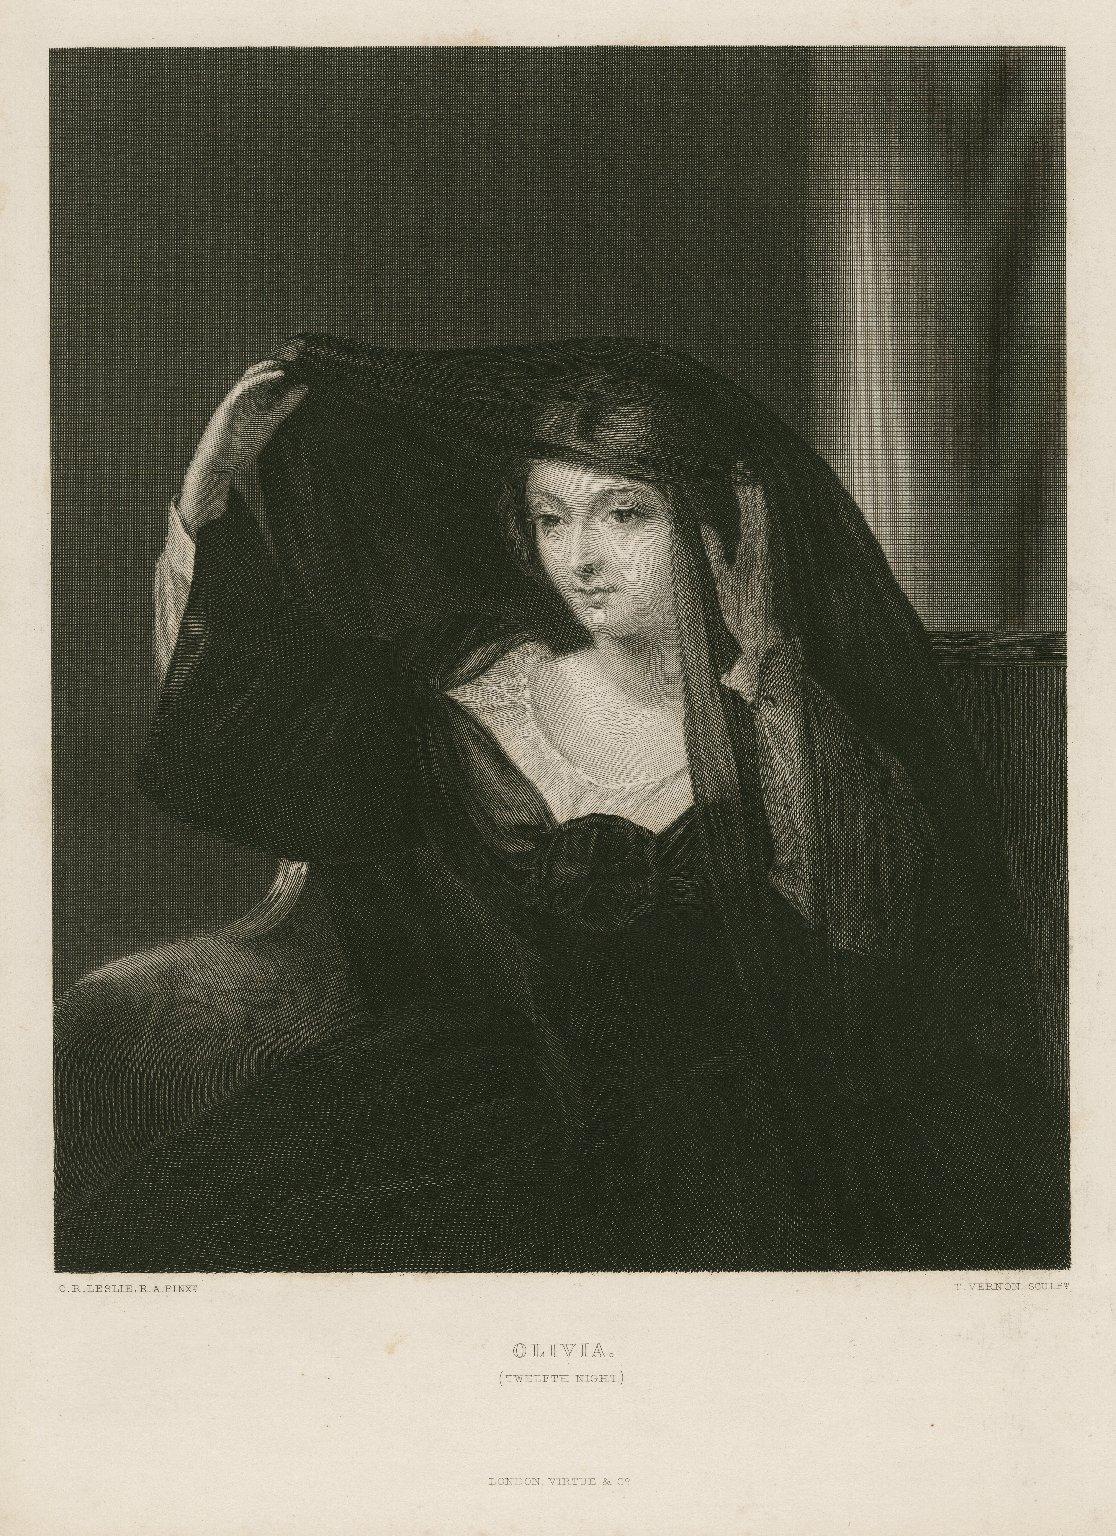 Olivia (Twelfth night) [graphic] / C. R. Leslie R. A. pinxt. ; T. Vernon sculpt.